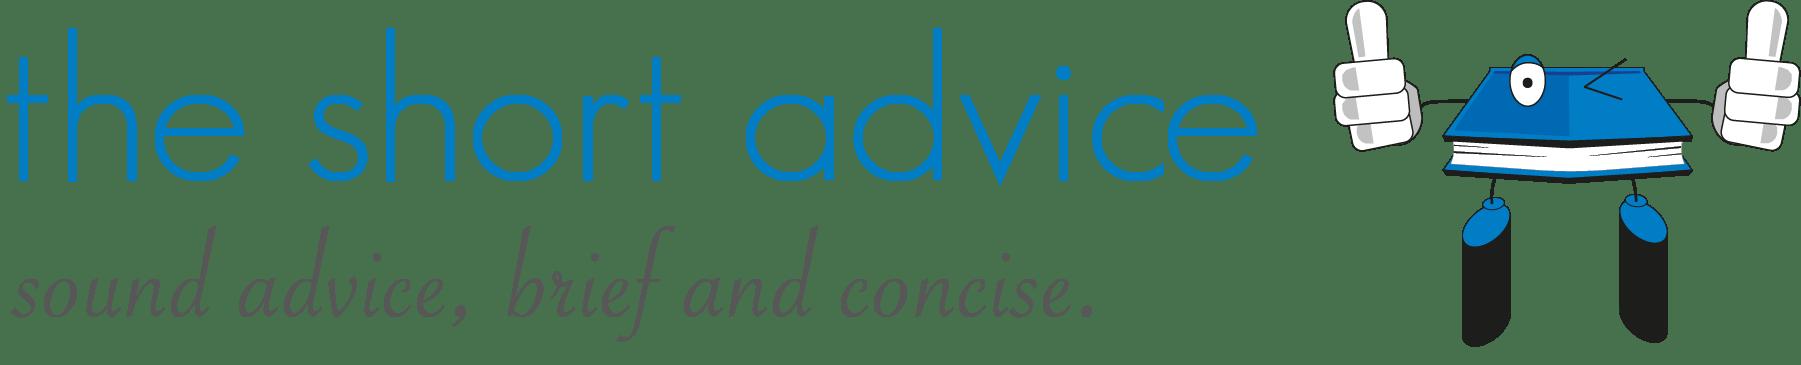 The Short Advice Logo